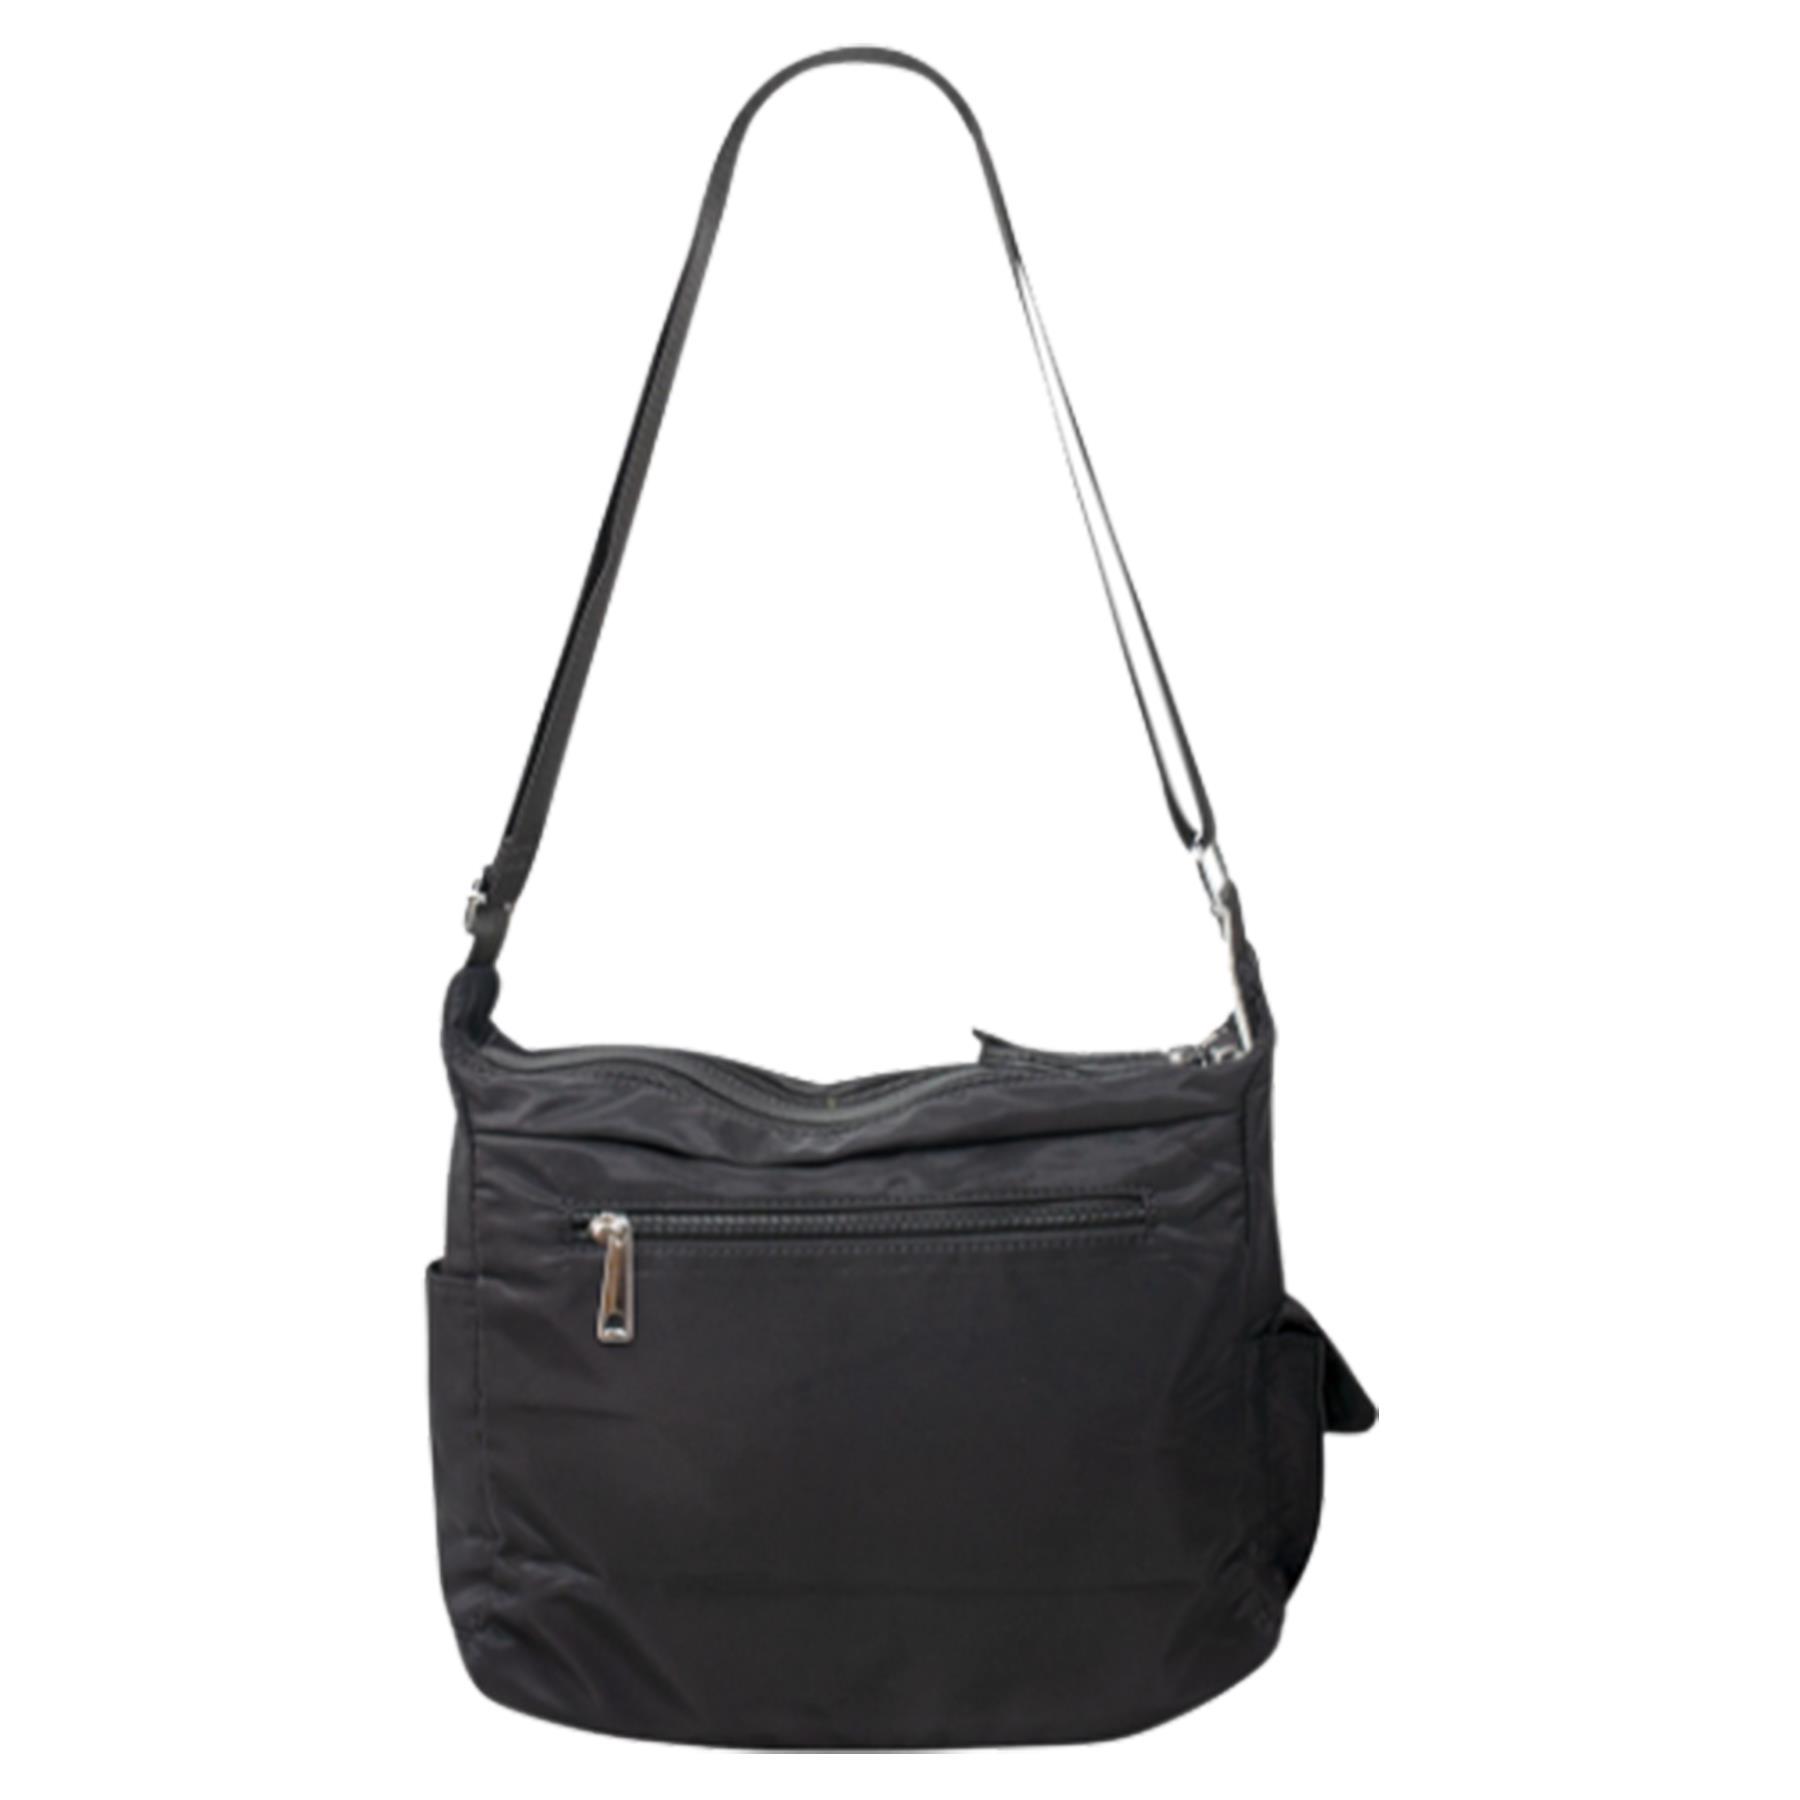 New-Ladies-Men-s-Showerproof-School-College-Practical-Basic-Crossbody-Bag thumbnail 4